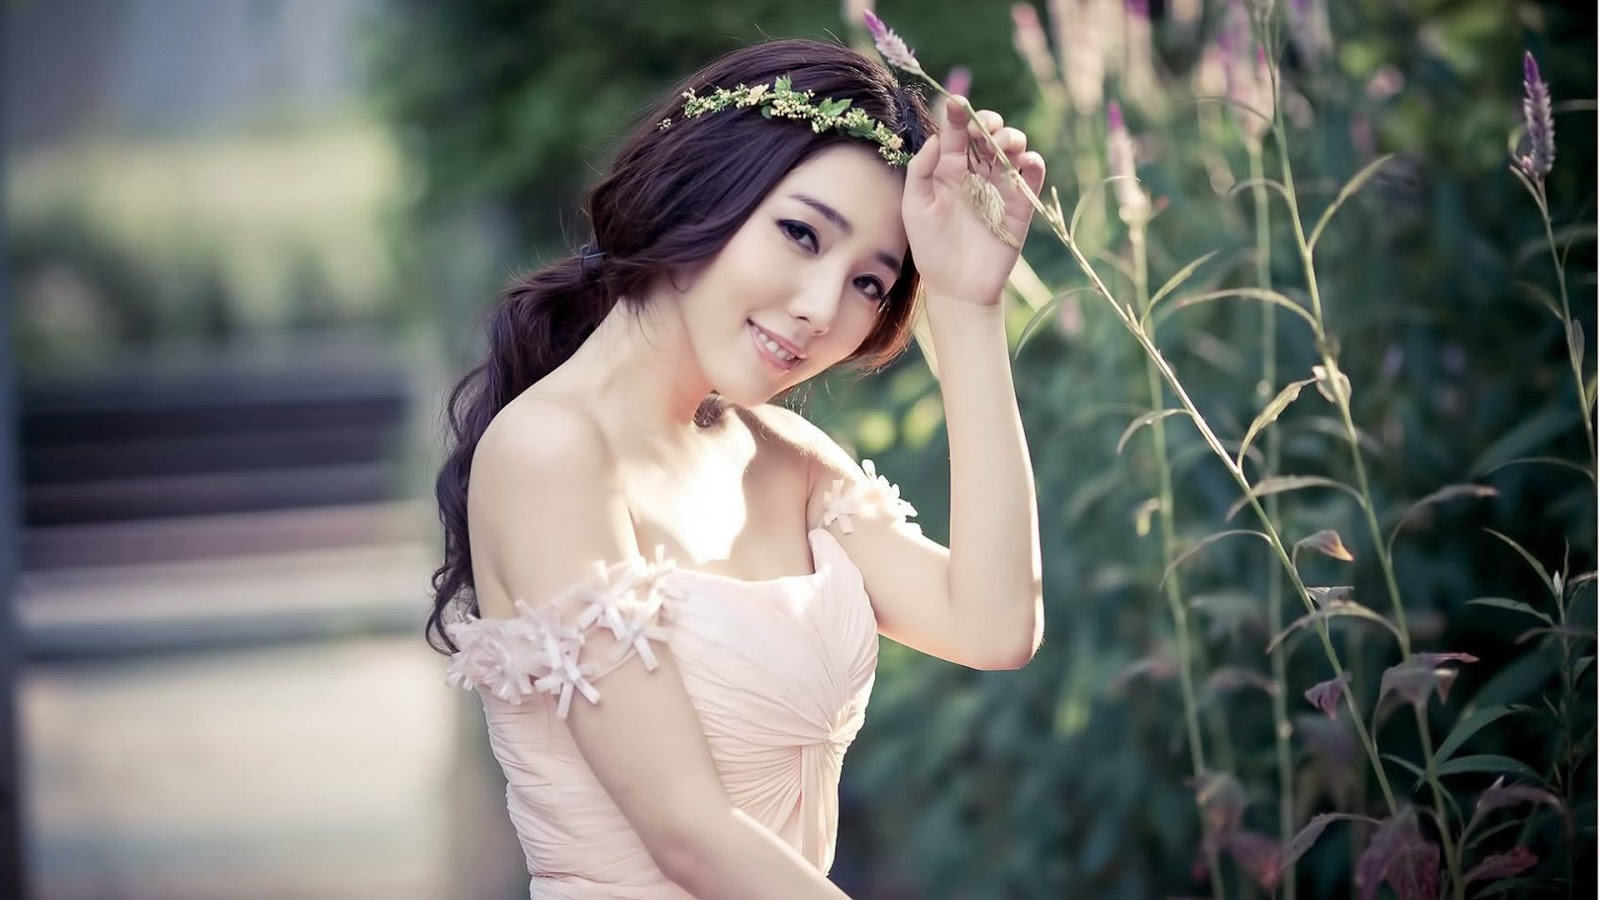 Beautiful Girls Hd Wallpapers Free Download